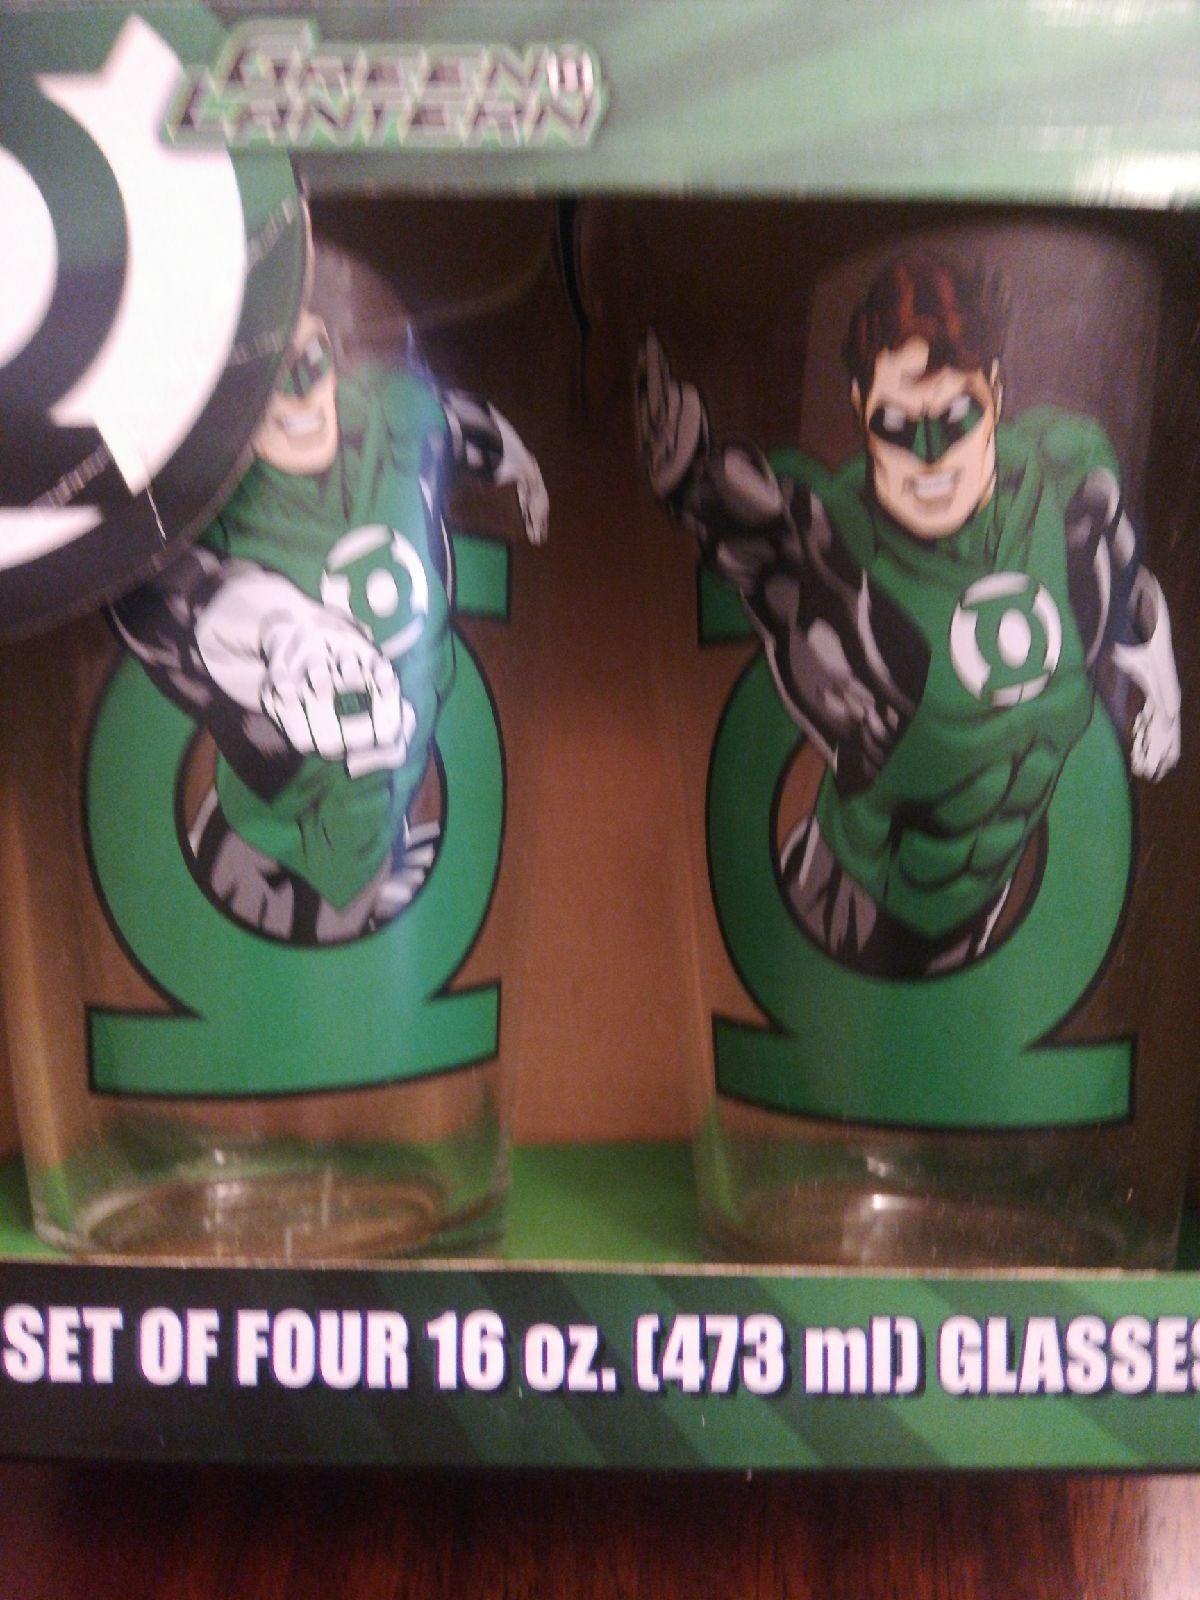 Green Lantern Glasses set of 2 new